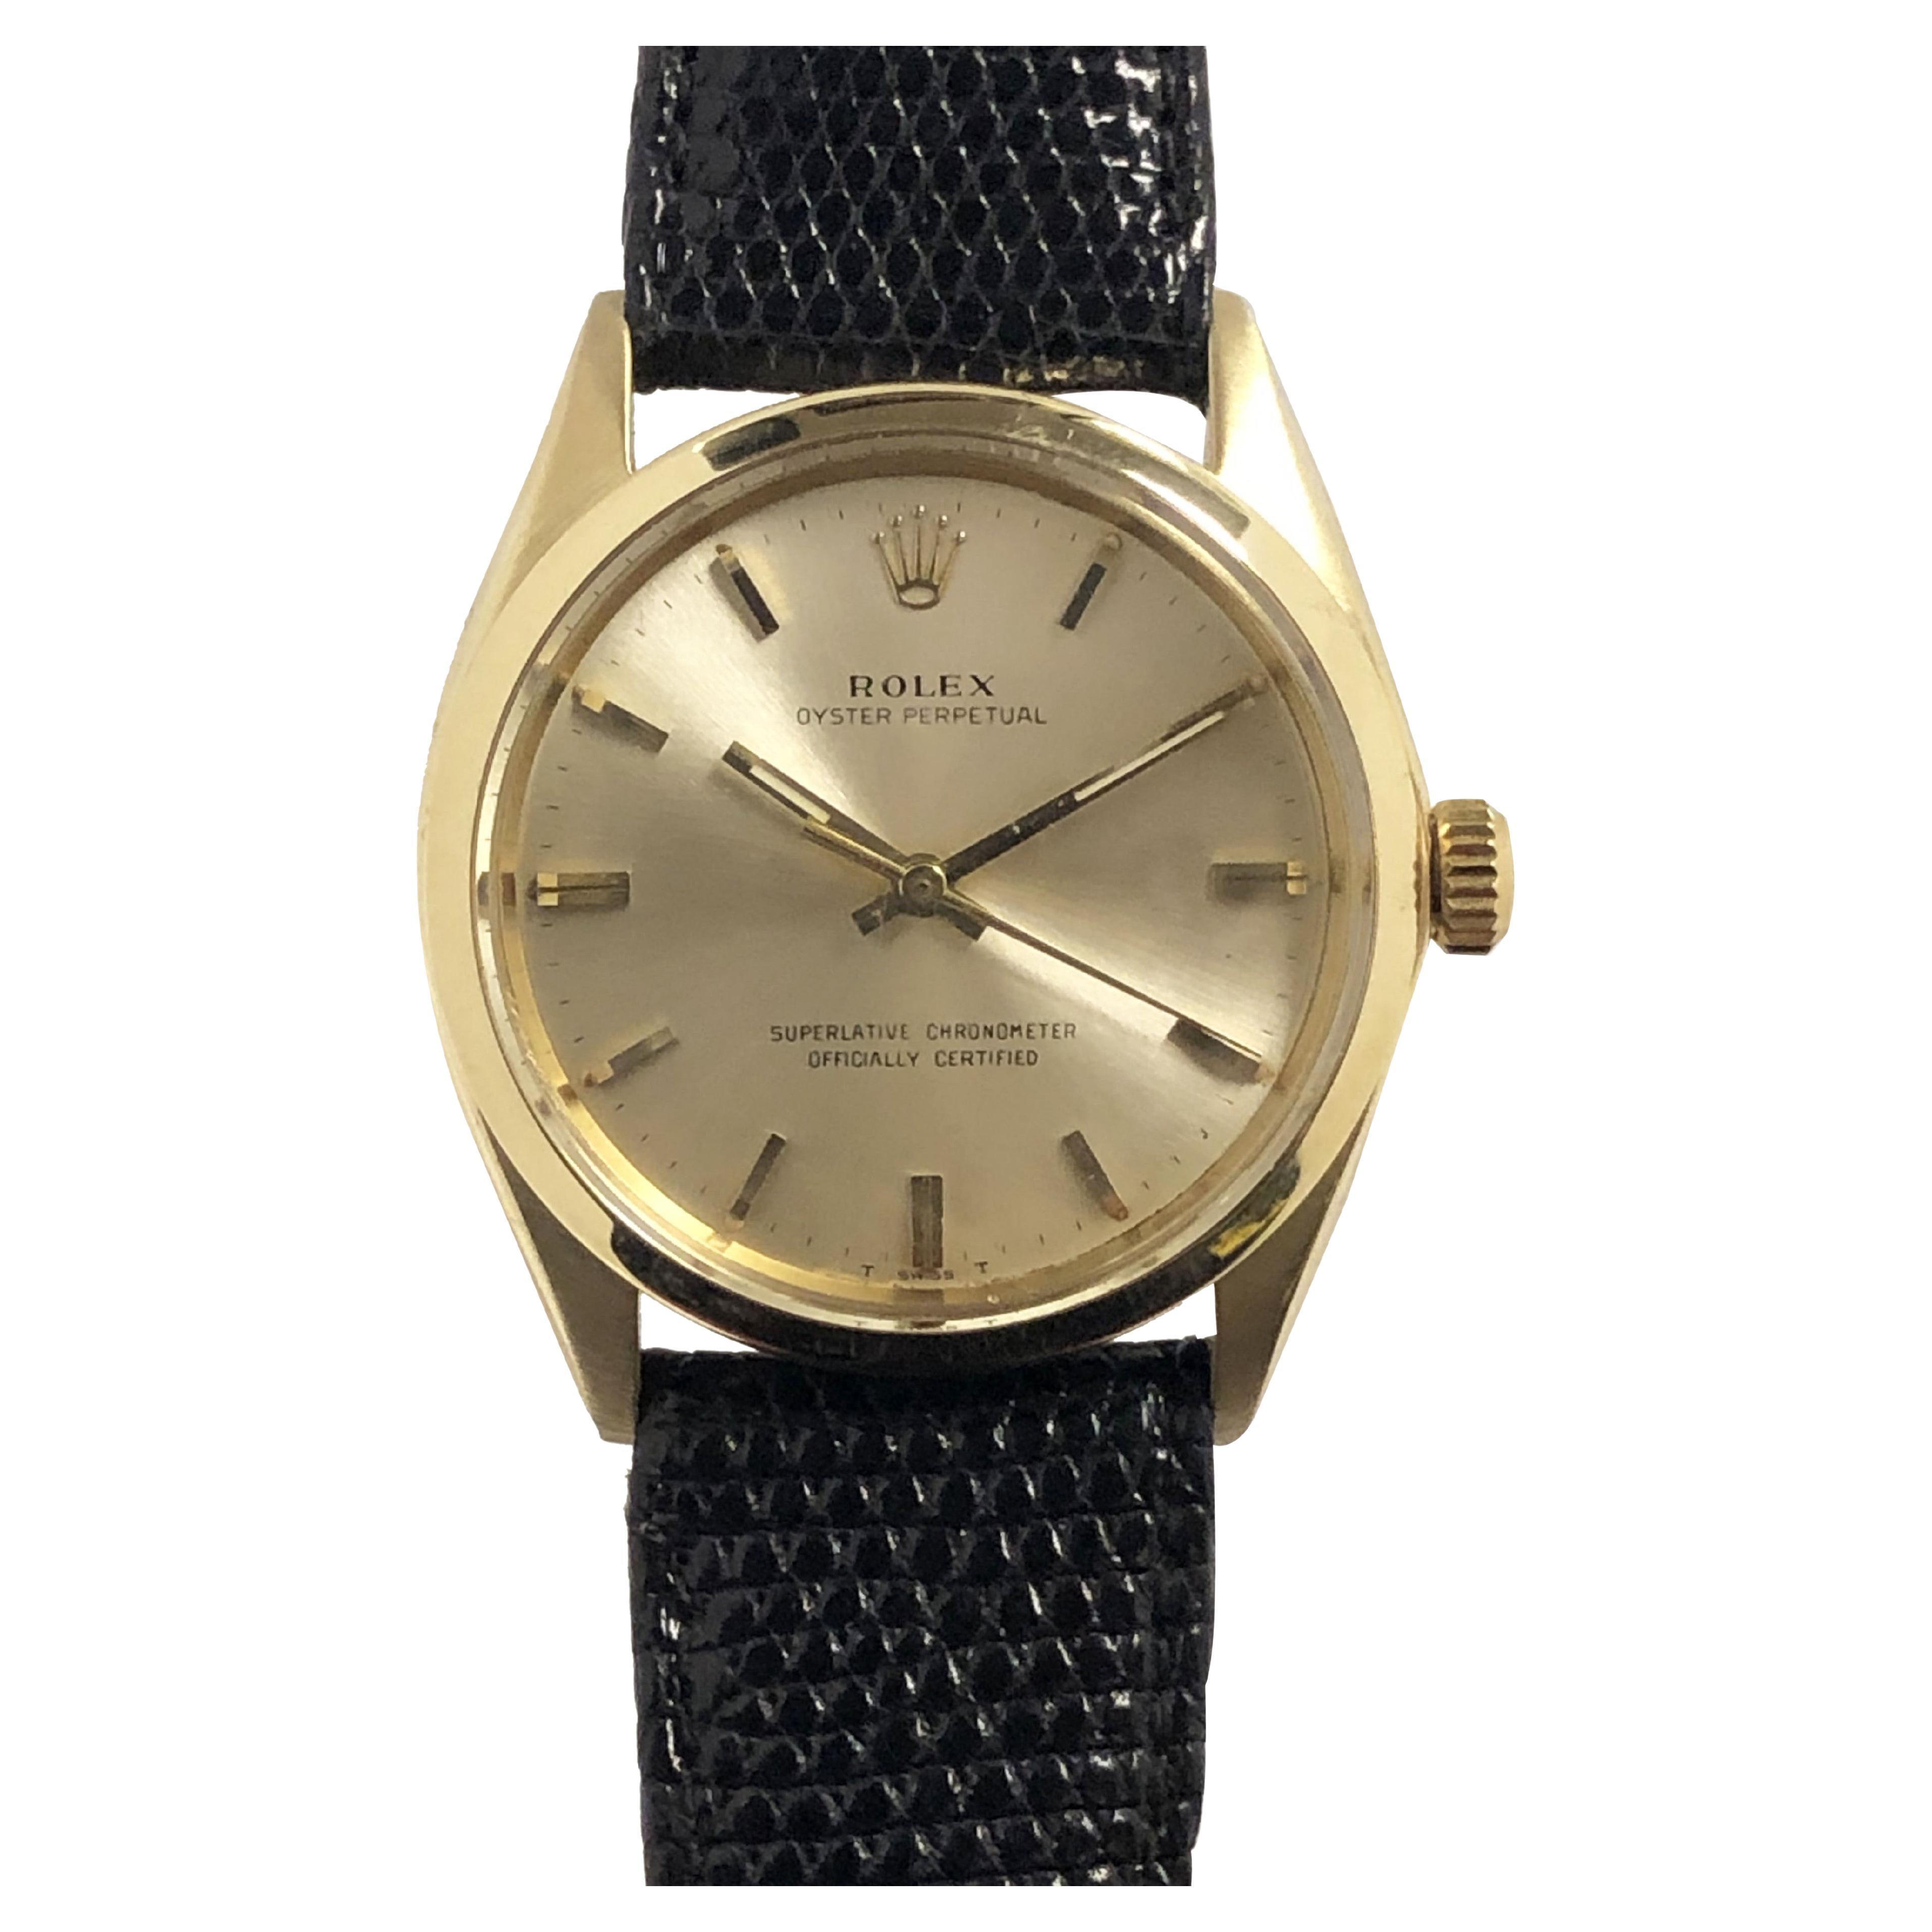 Rolex Vintage Ref 1002 Yellow Gold Automatic Gents Wrist Watch